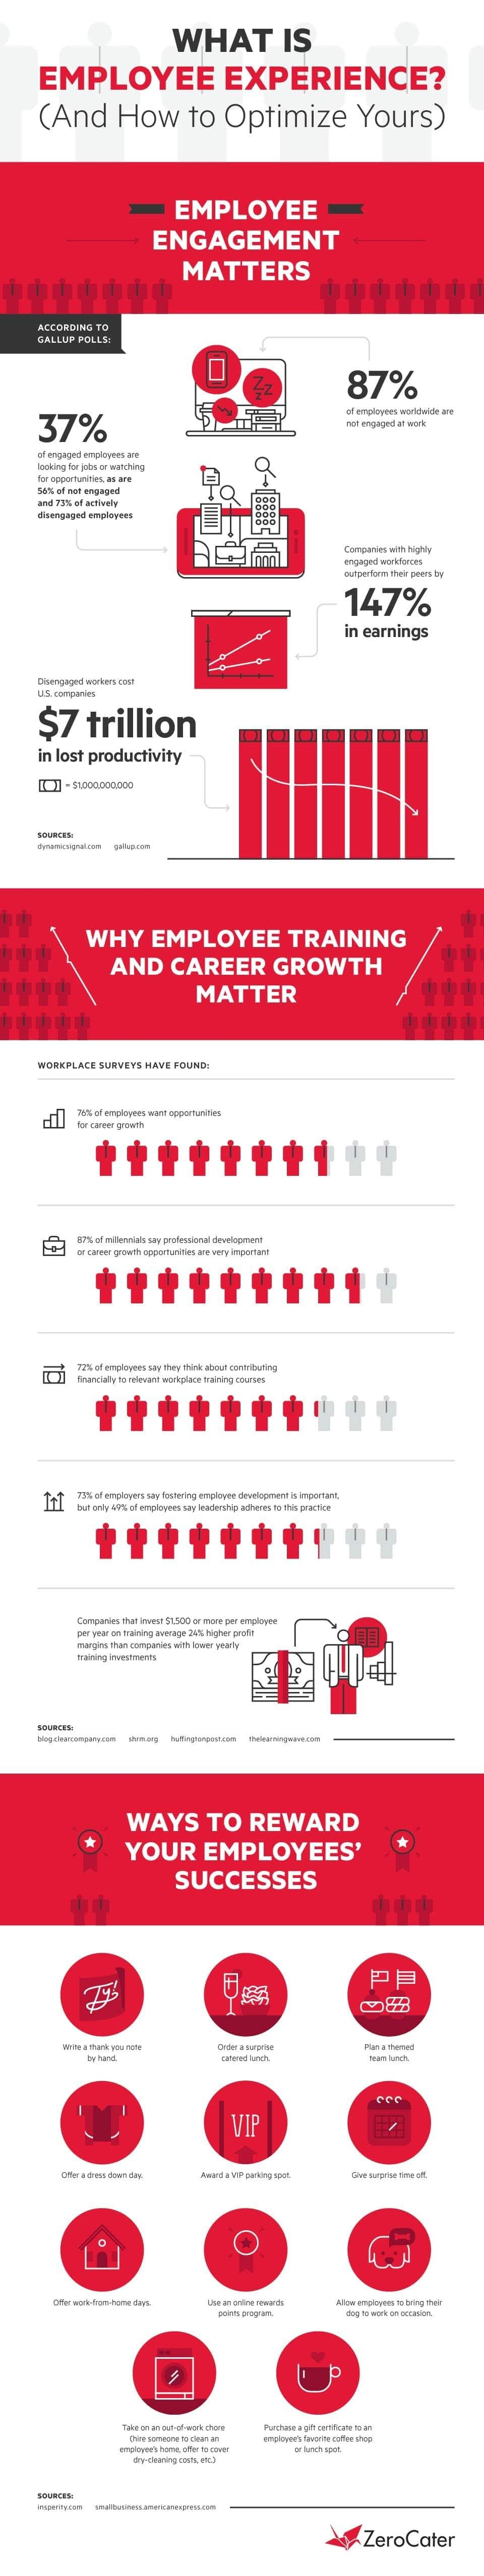 Employee Experience info